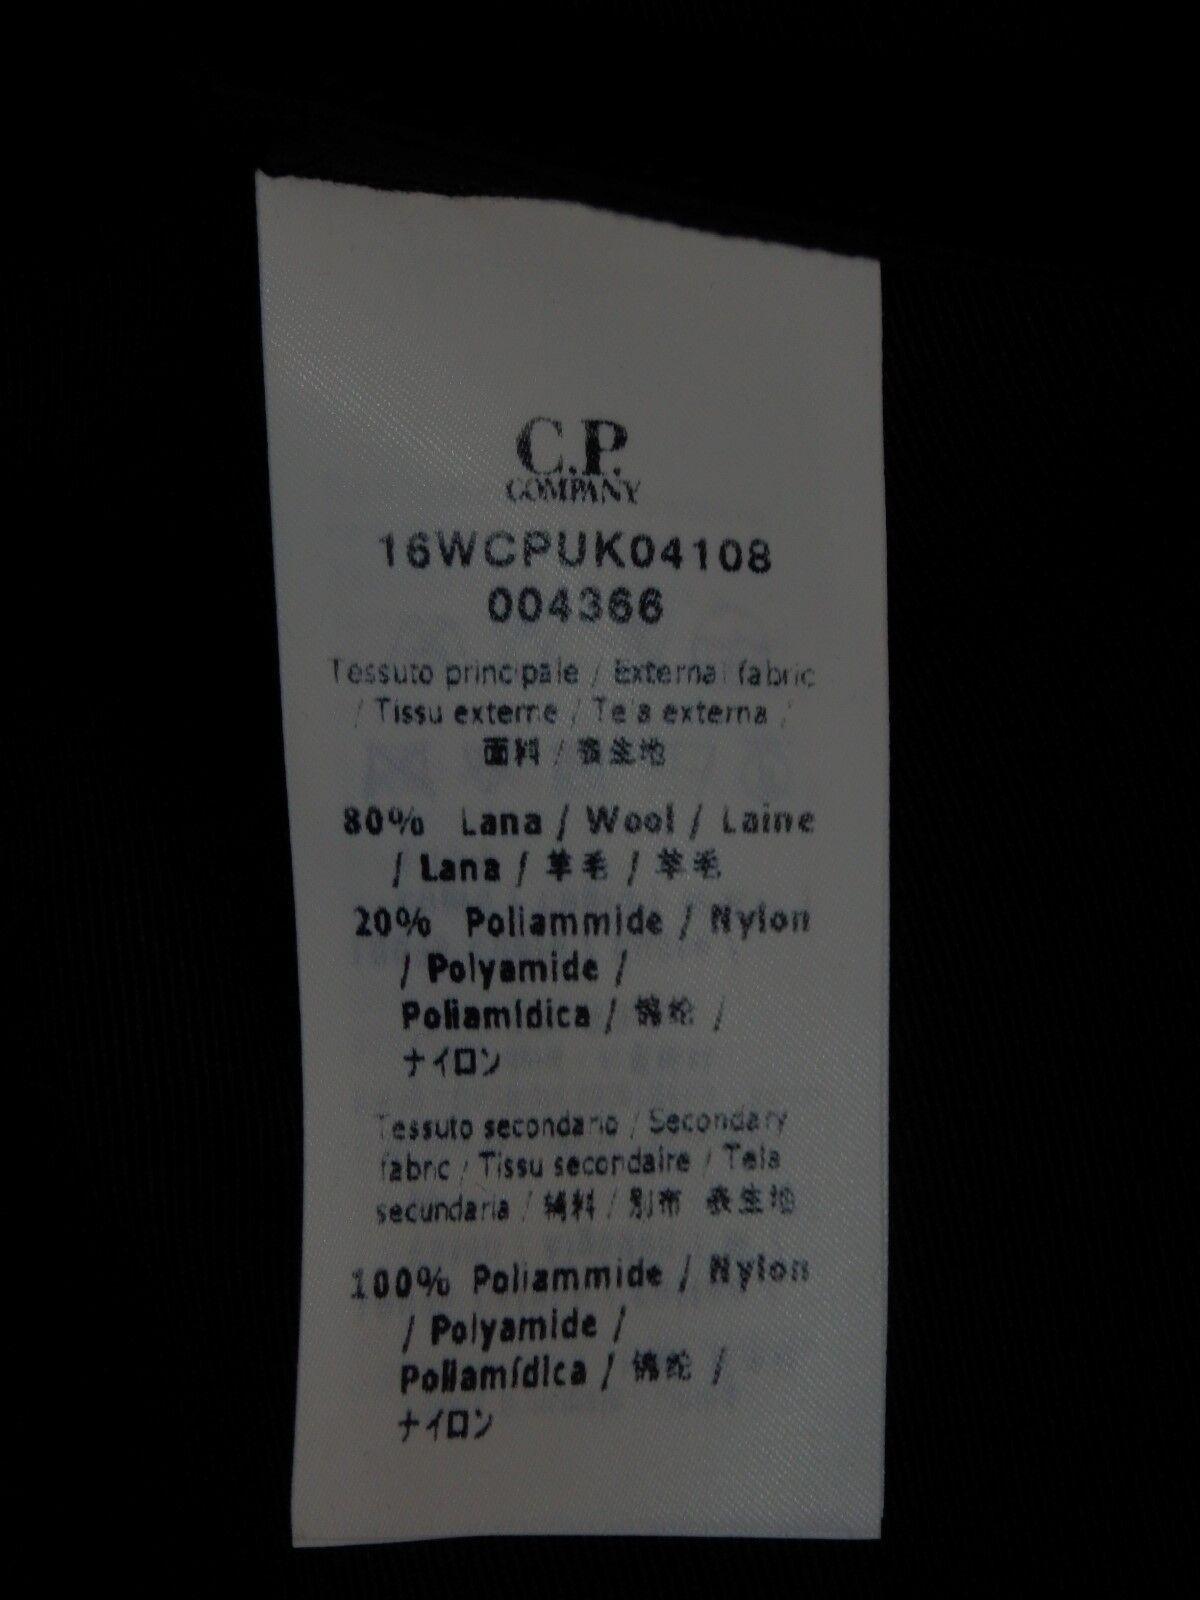 CP COMPANY - - - MANTEAU - LAINE - t. 52 - LAINE - NEUF - GENUINE 1a5df2